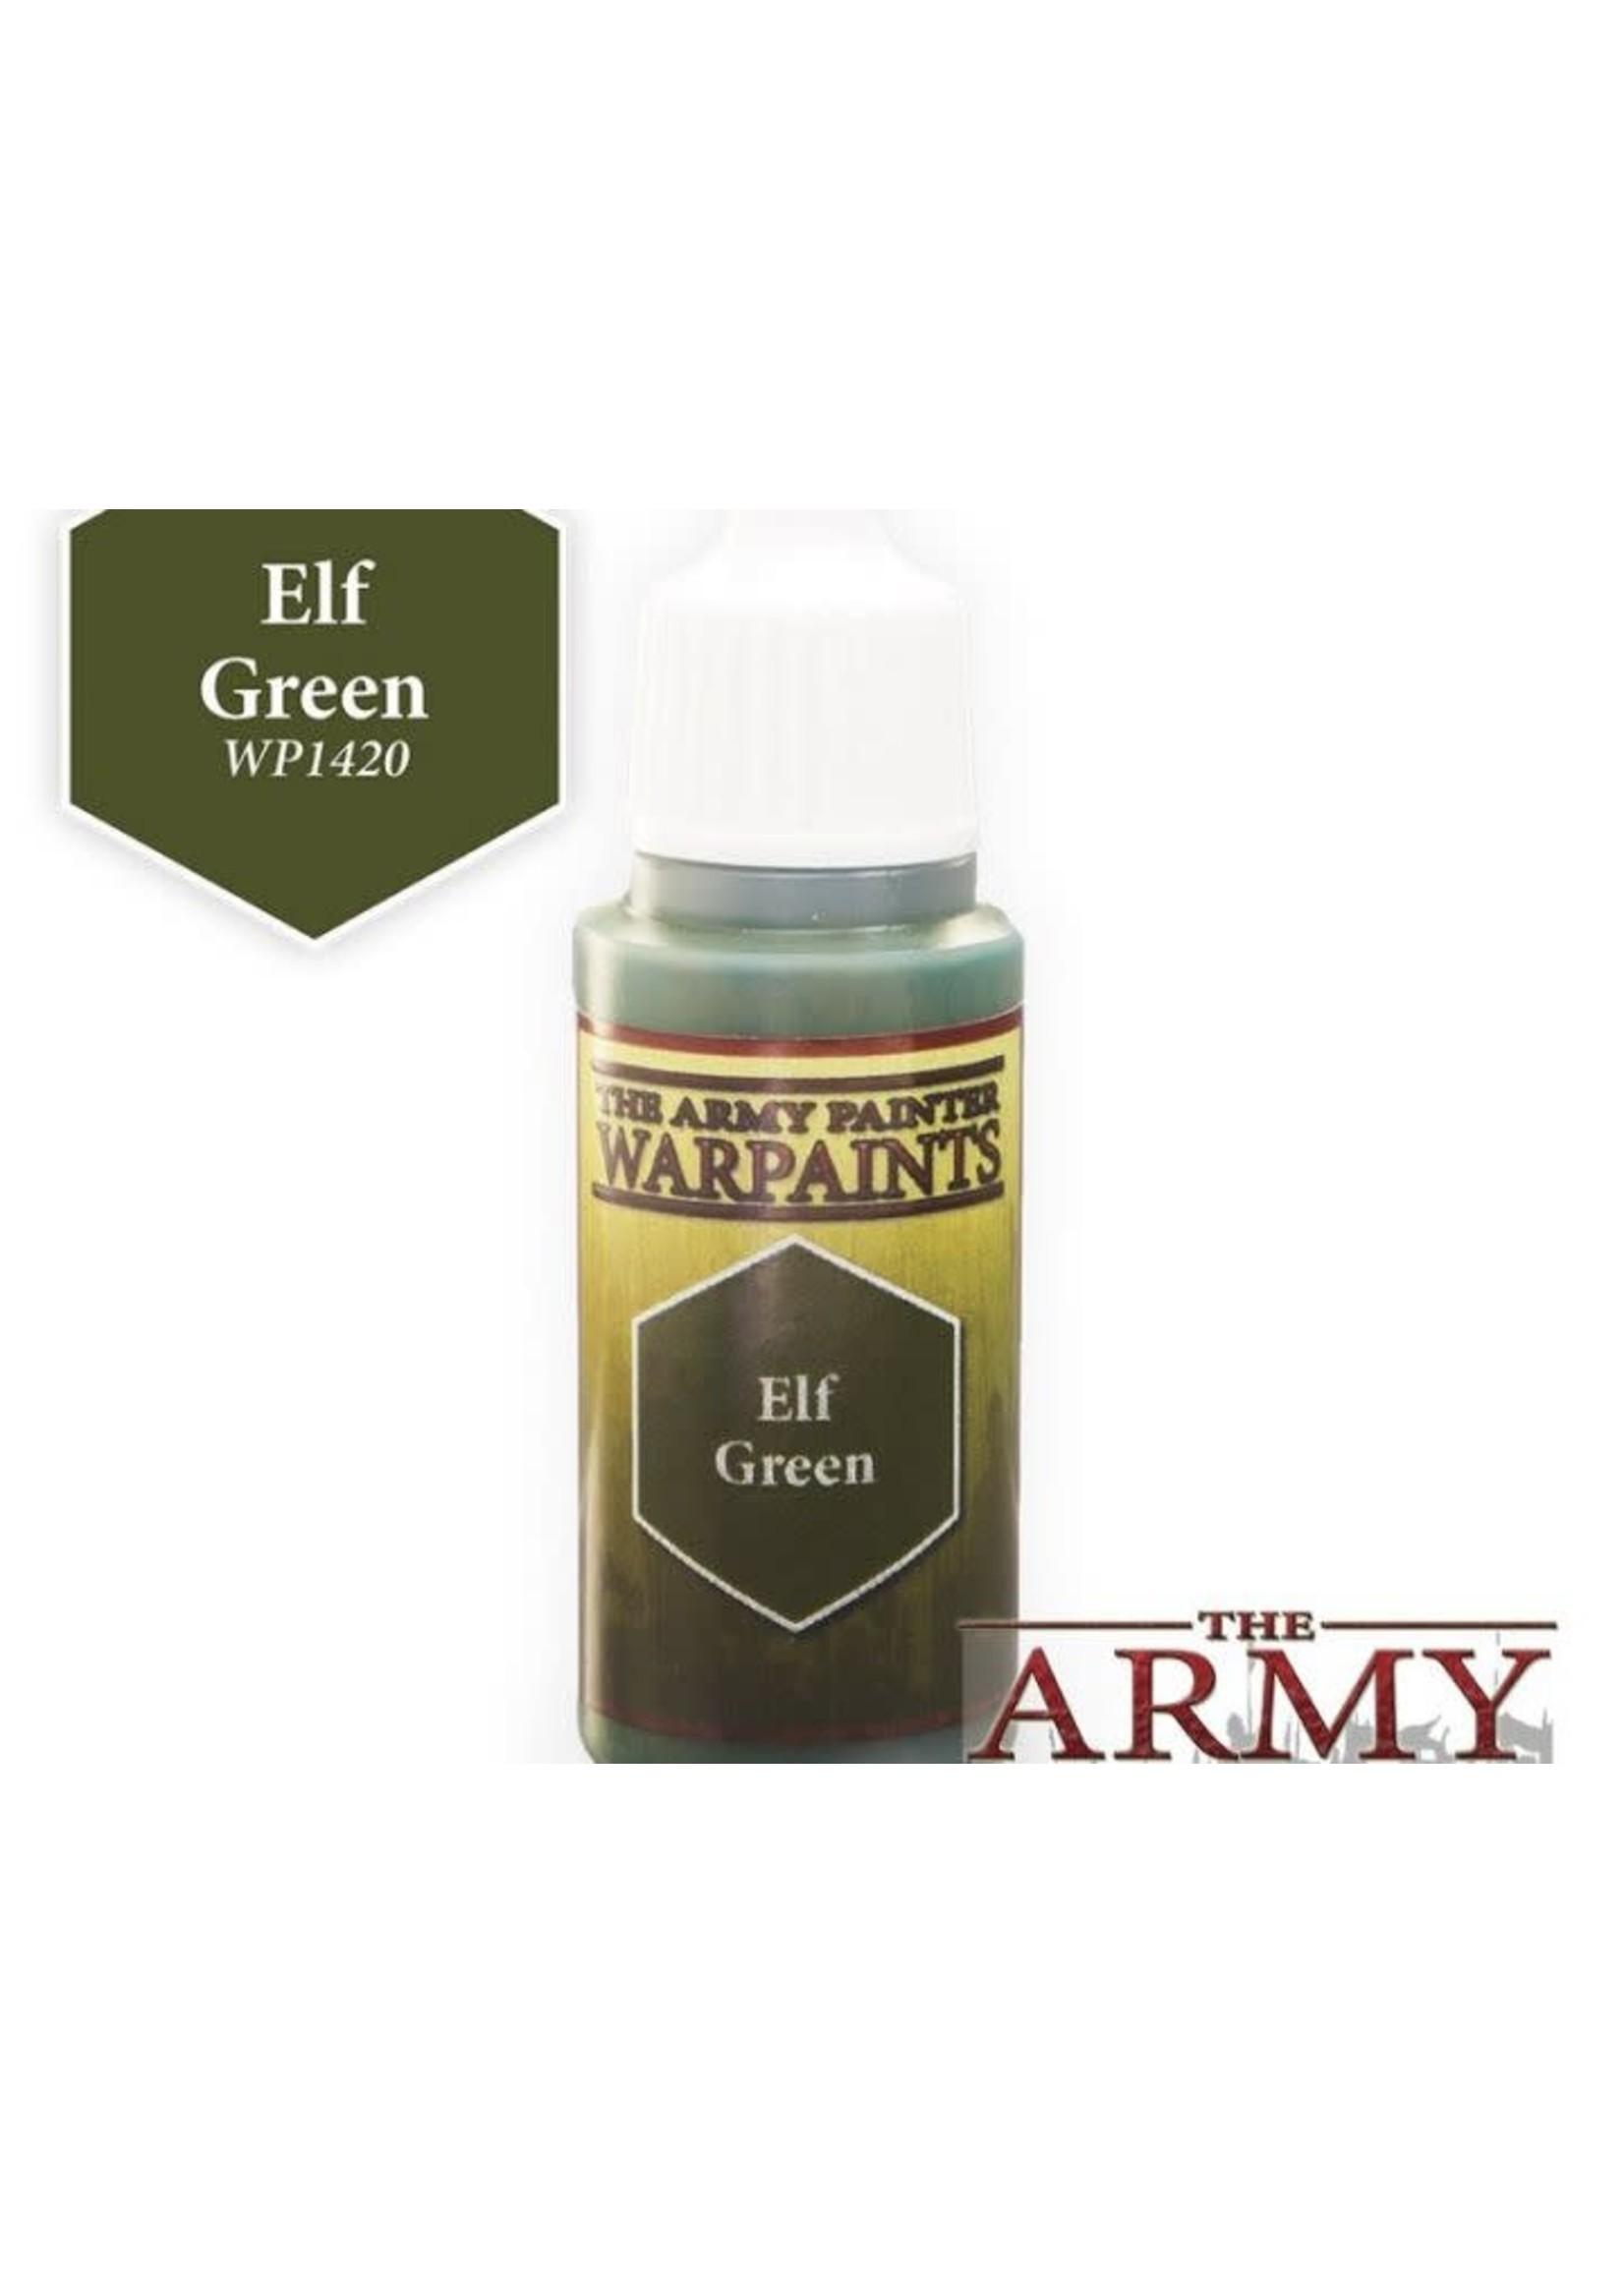 Army Painter Warpaints - Elf Green